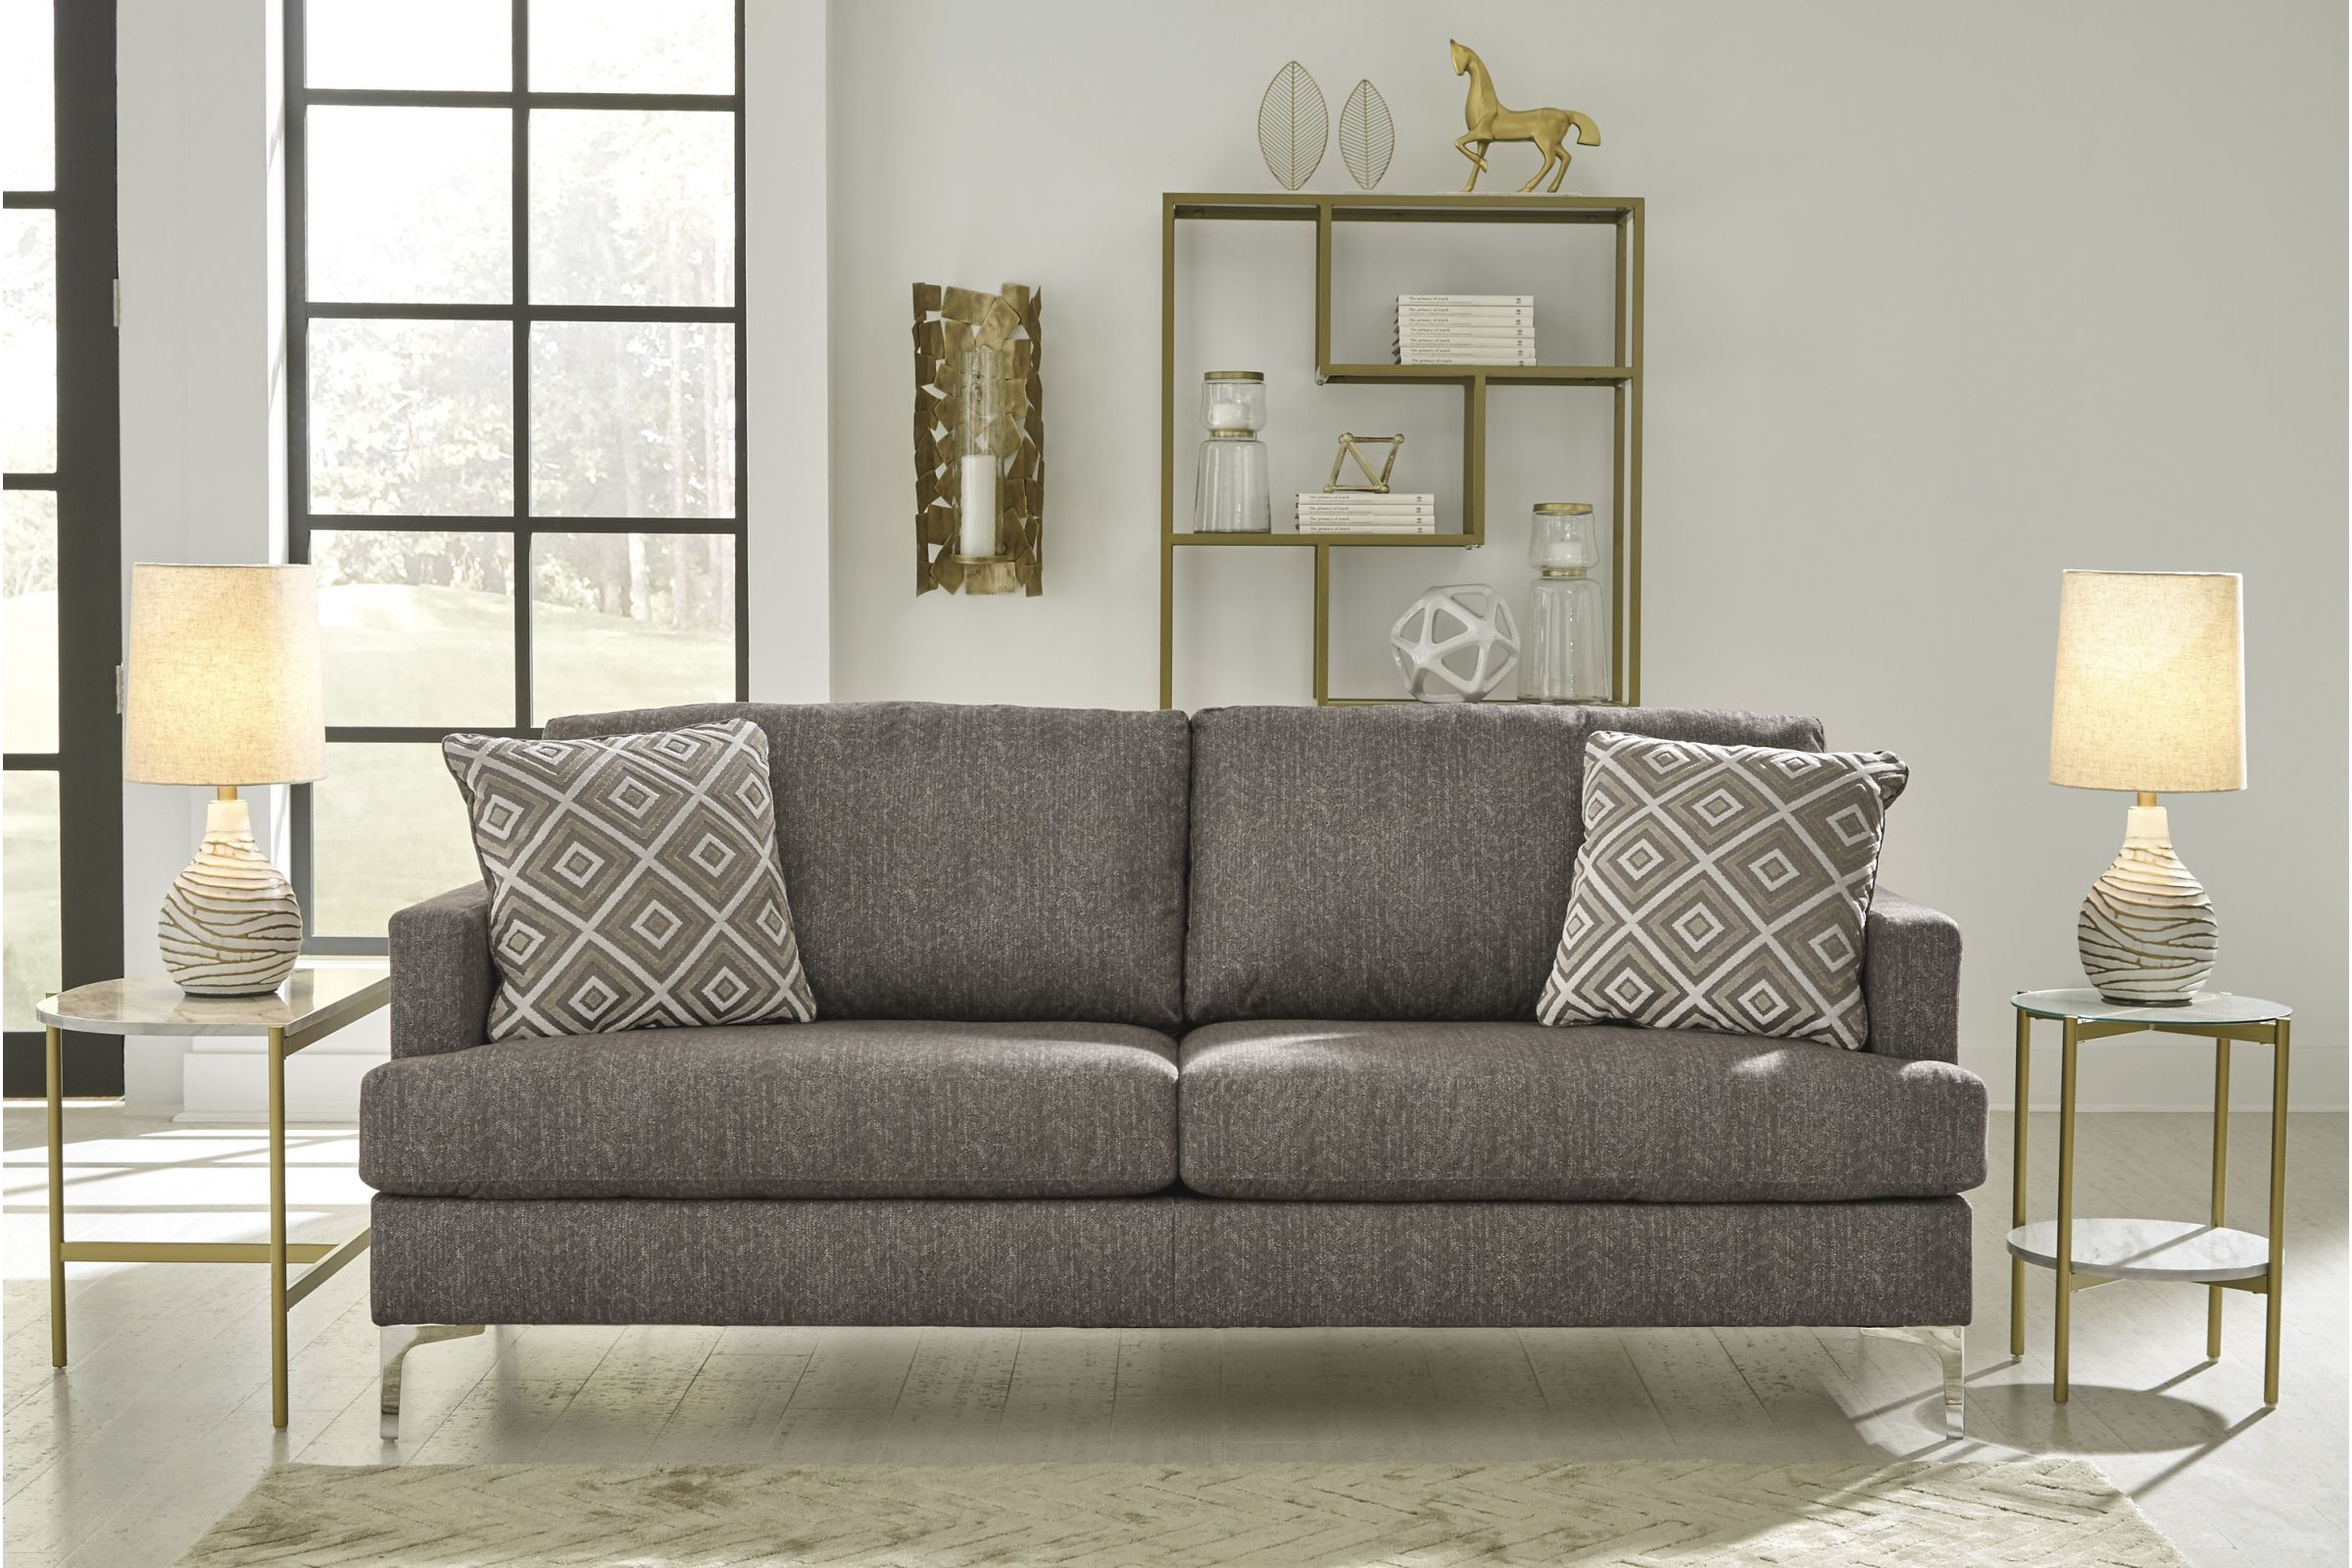 Arcola Java Sofa At Gardner White In 2021 Love Seat Ashley Furniture Living Room Inspiration